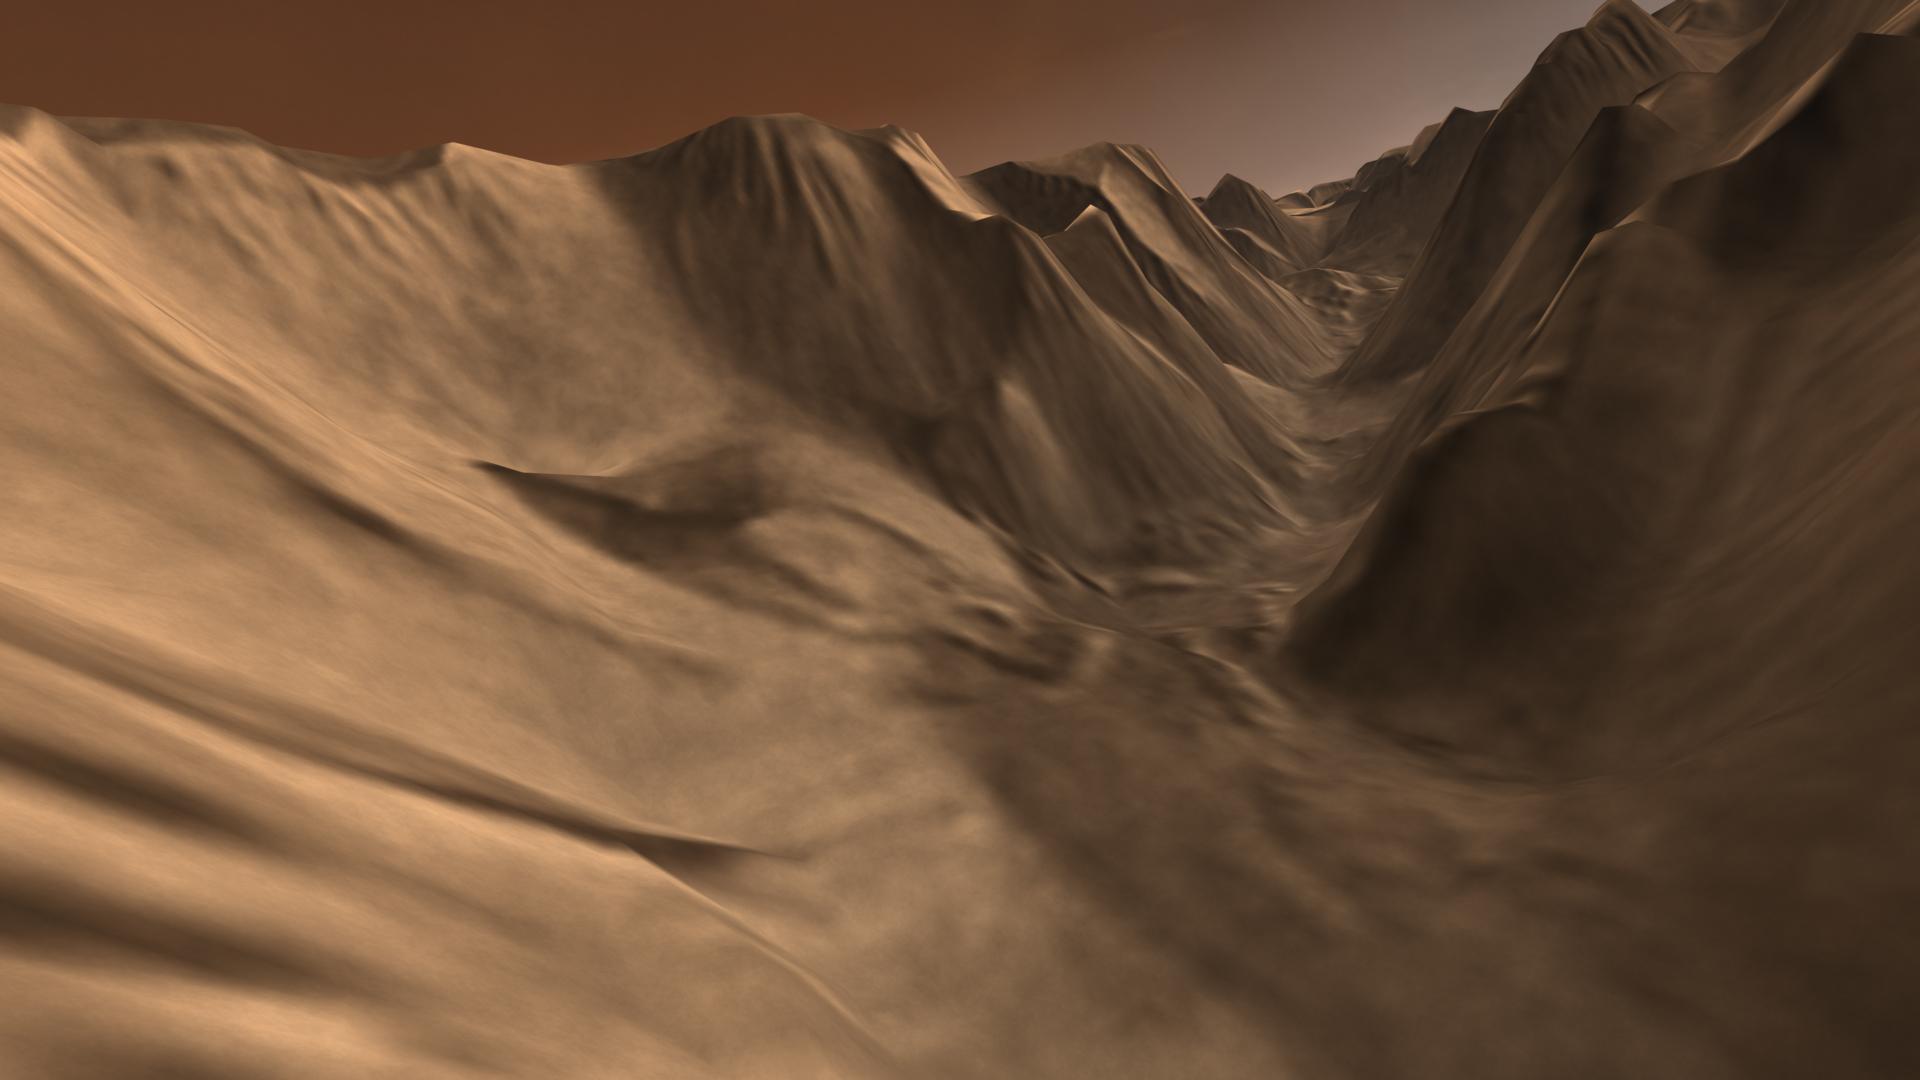 mars canyon nasa - photo #26